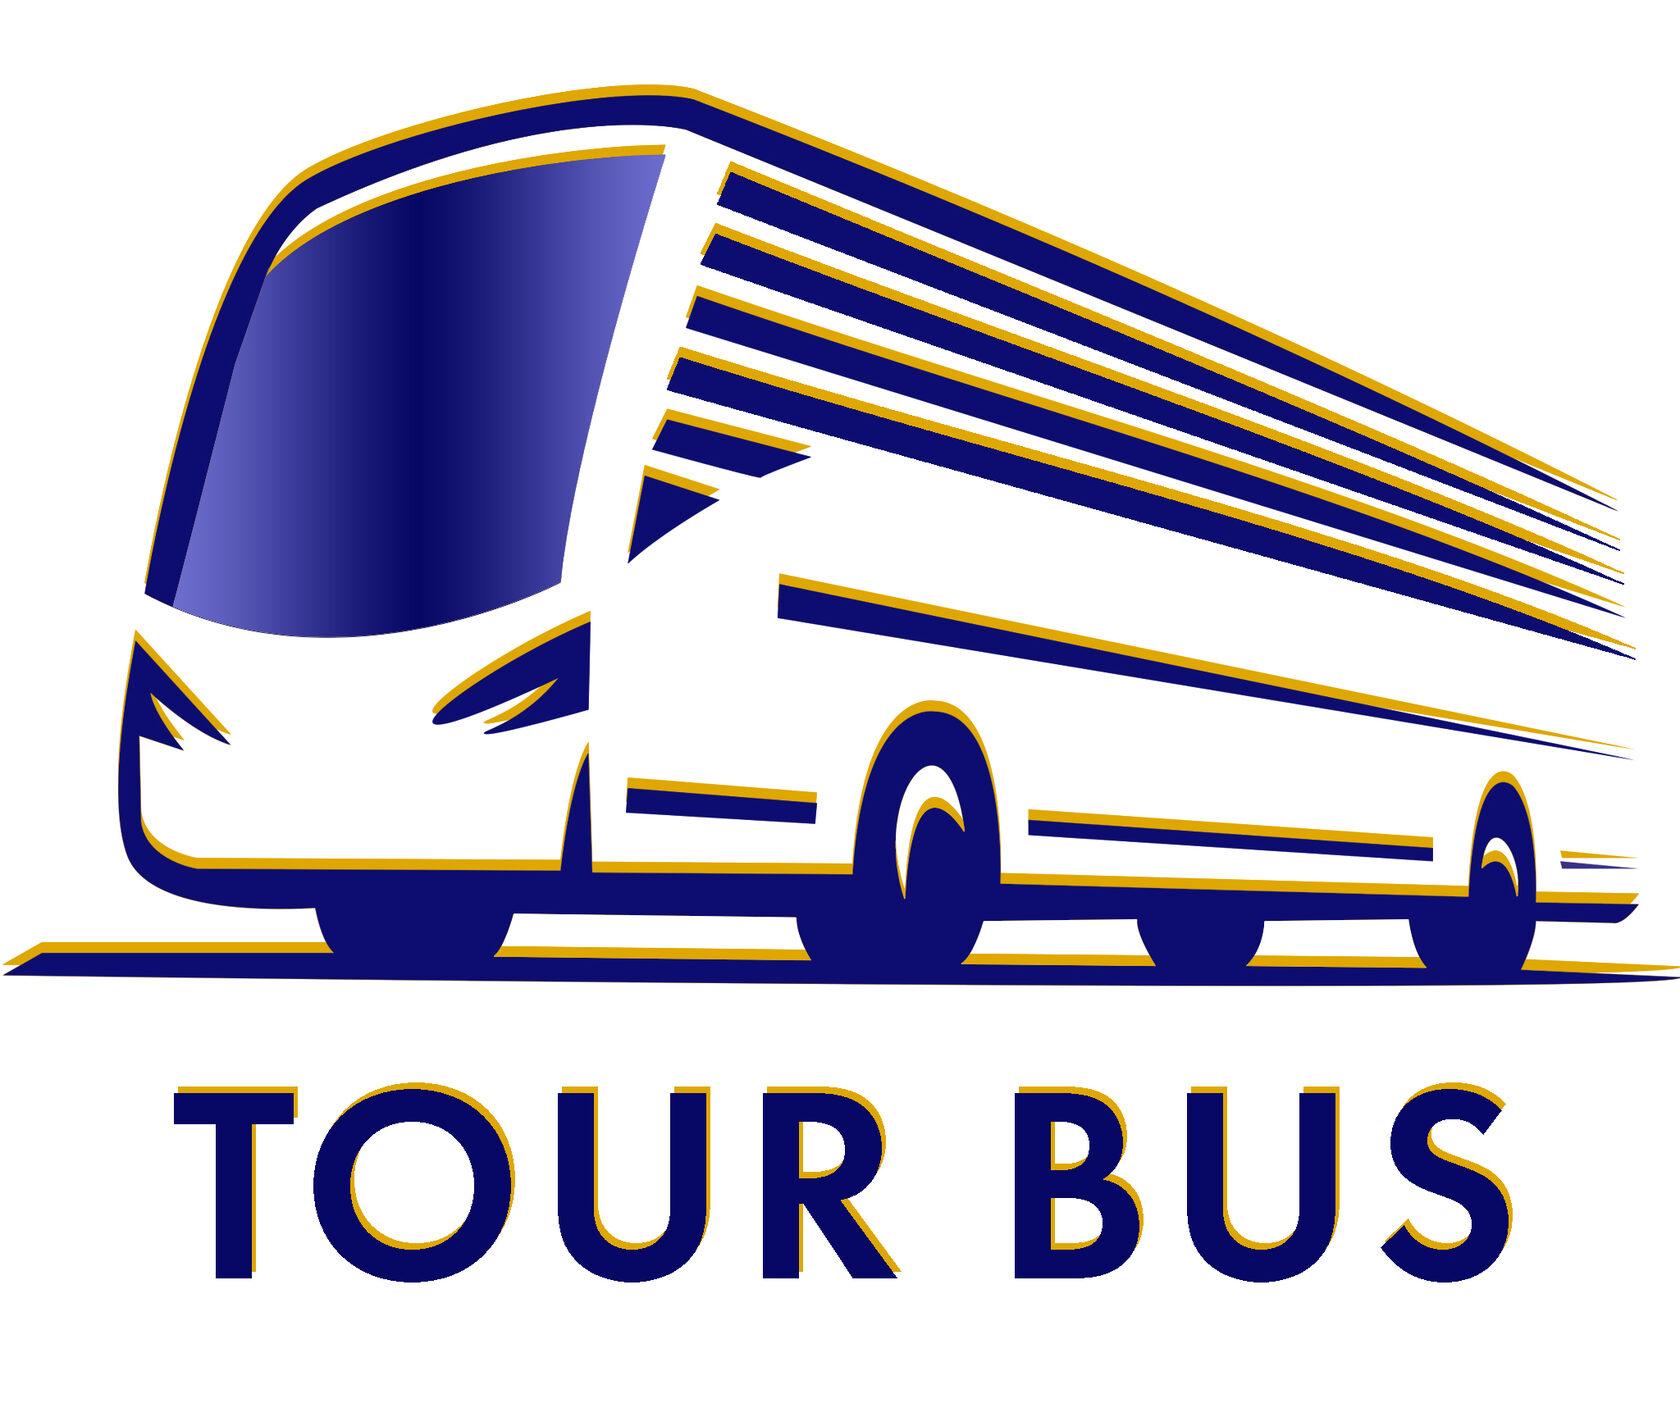 TourBus - аренда туристических автобусов с водителем